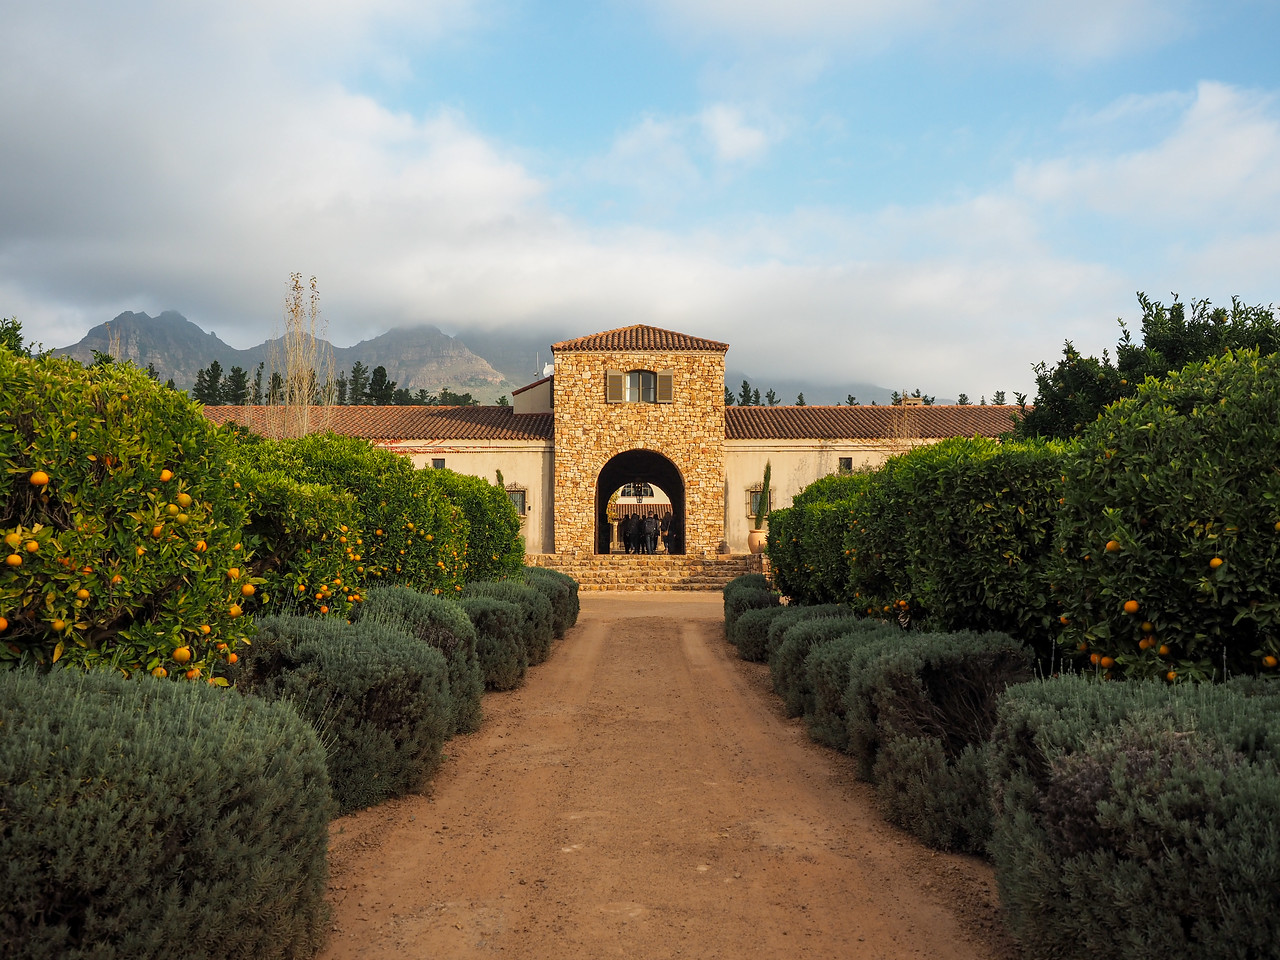 Waterford Estate winery in Stellenbosch, South Africa